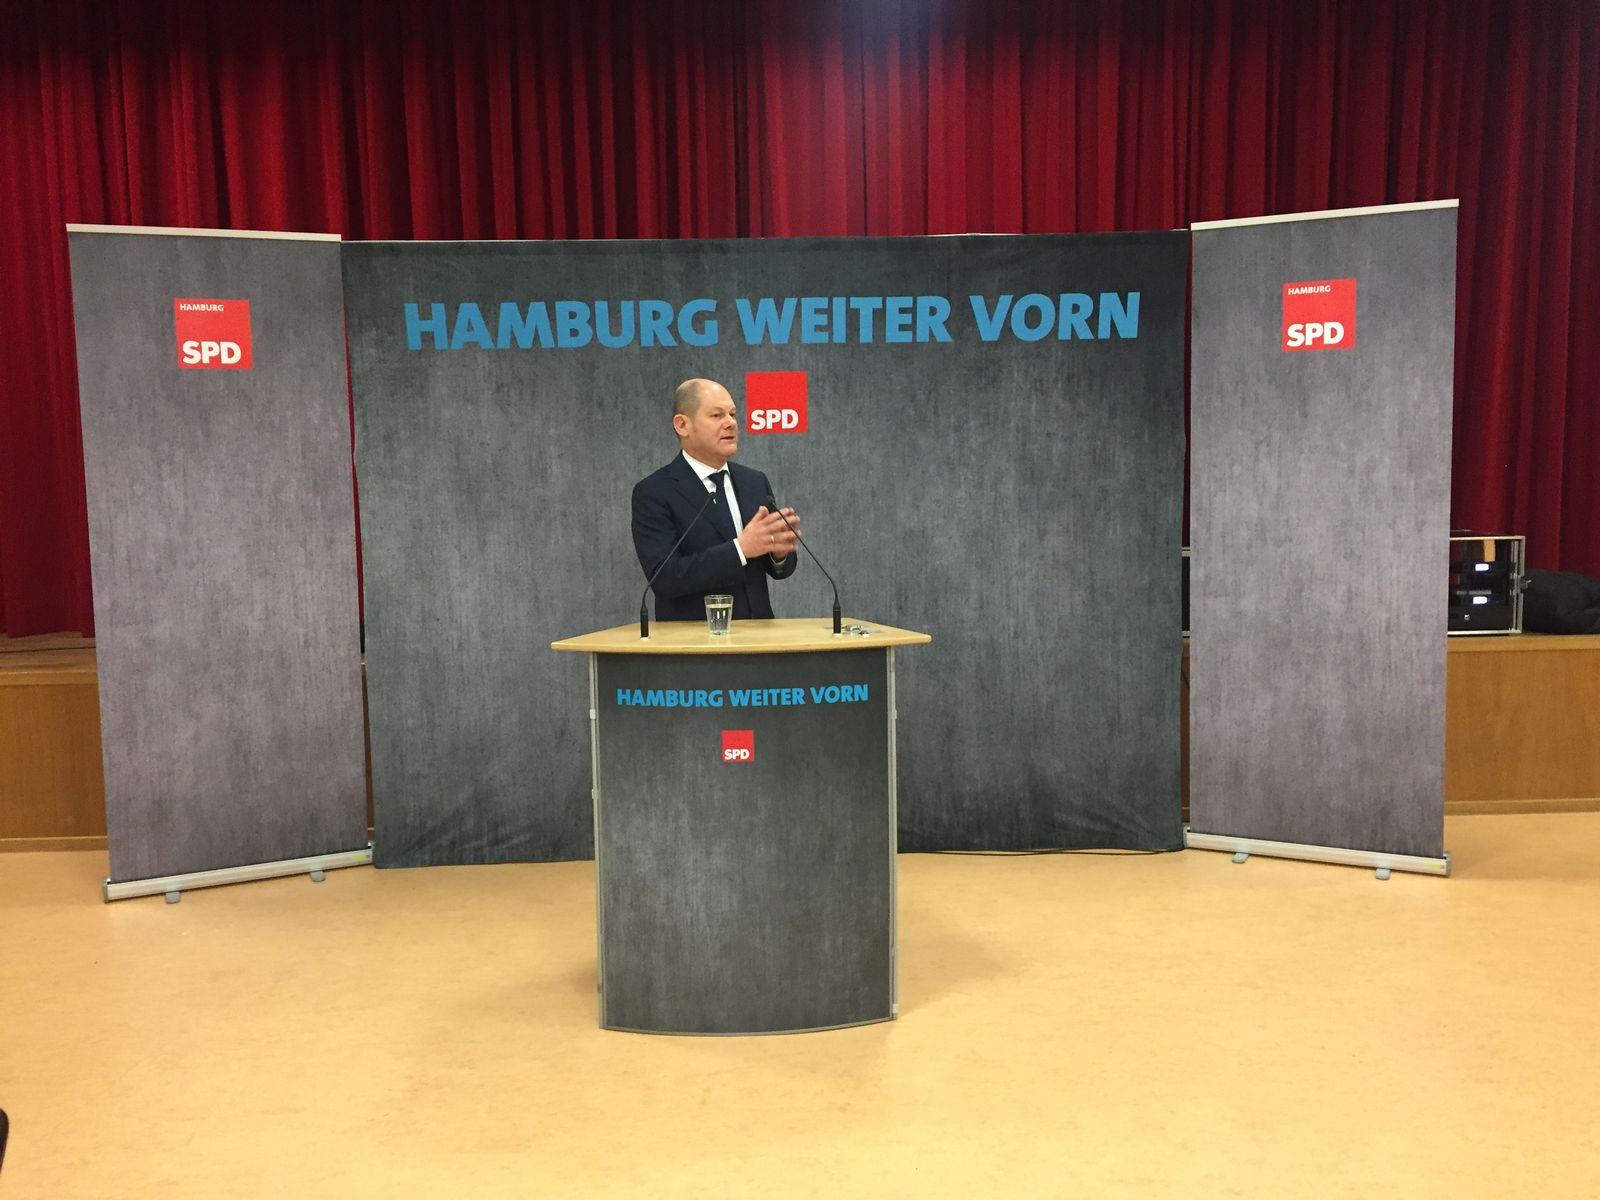 Hamburg/ Olaf Scholz